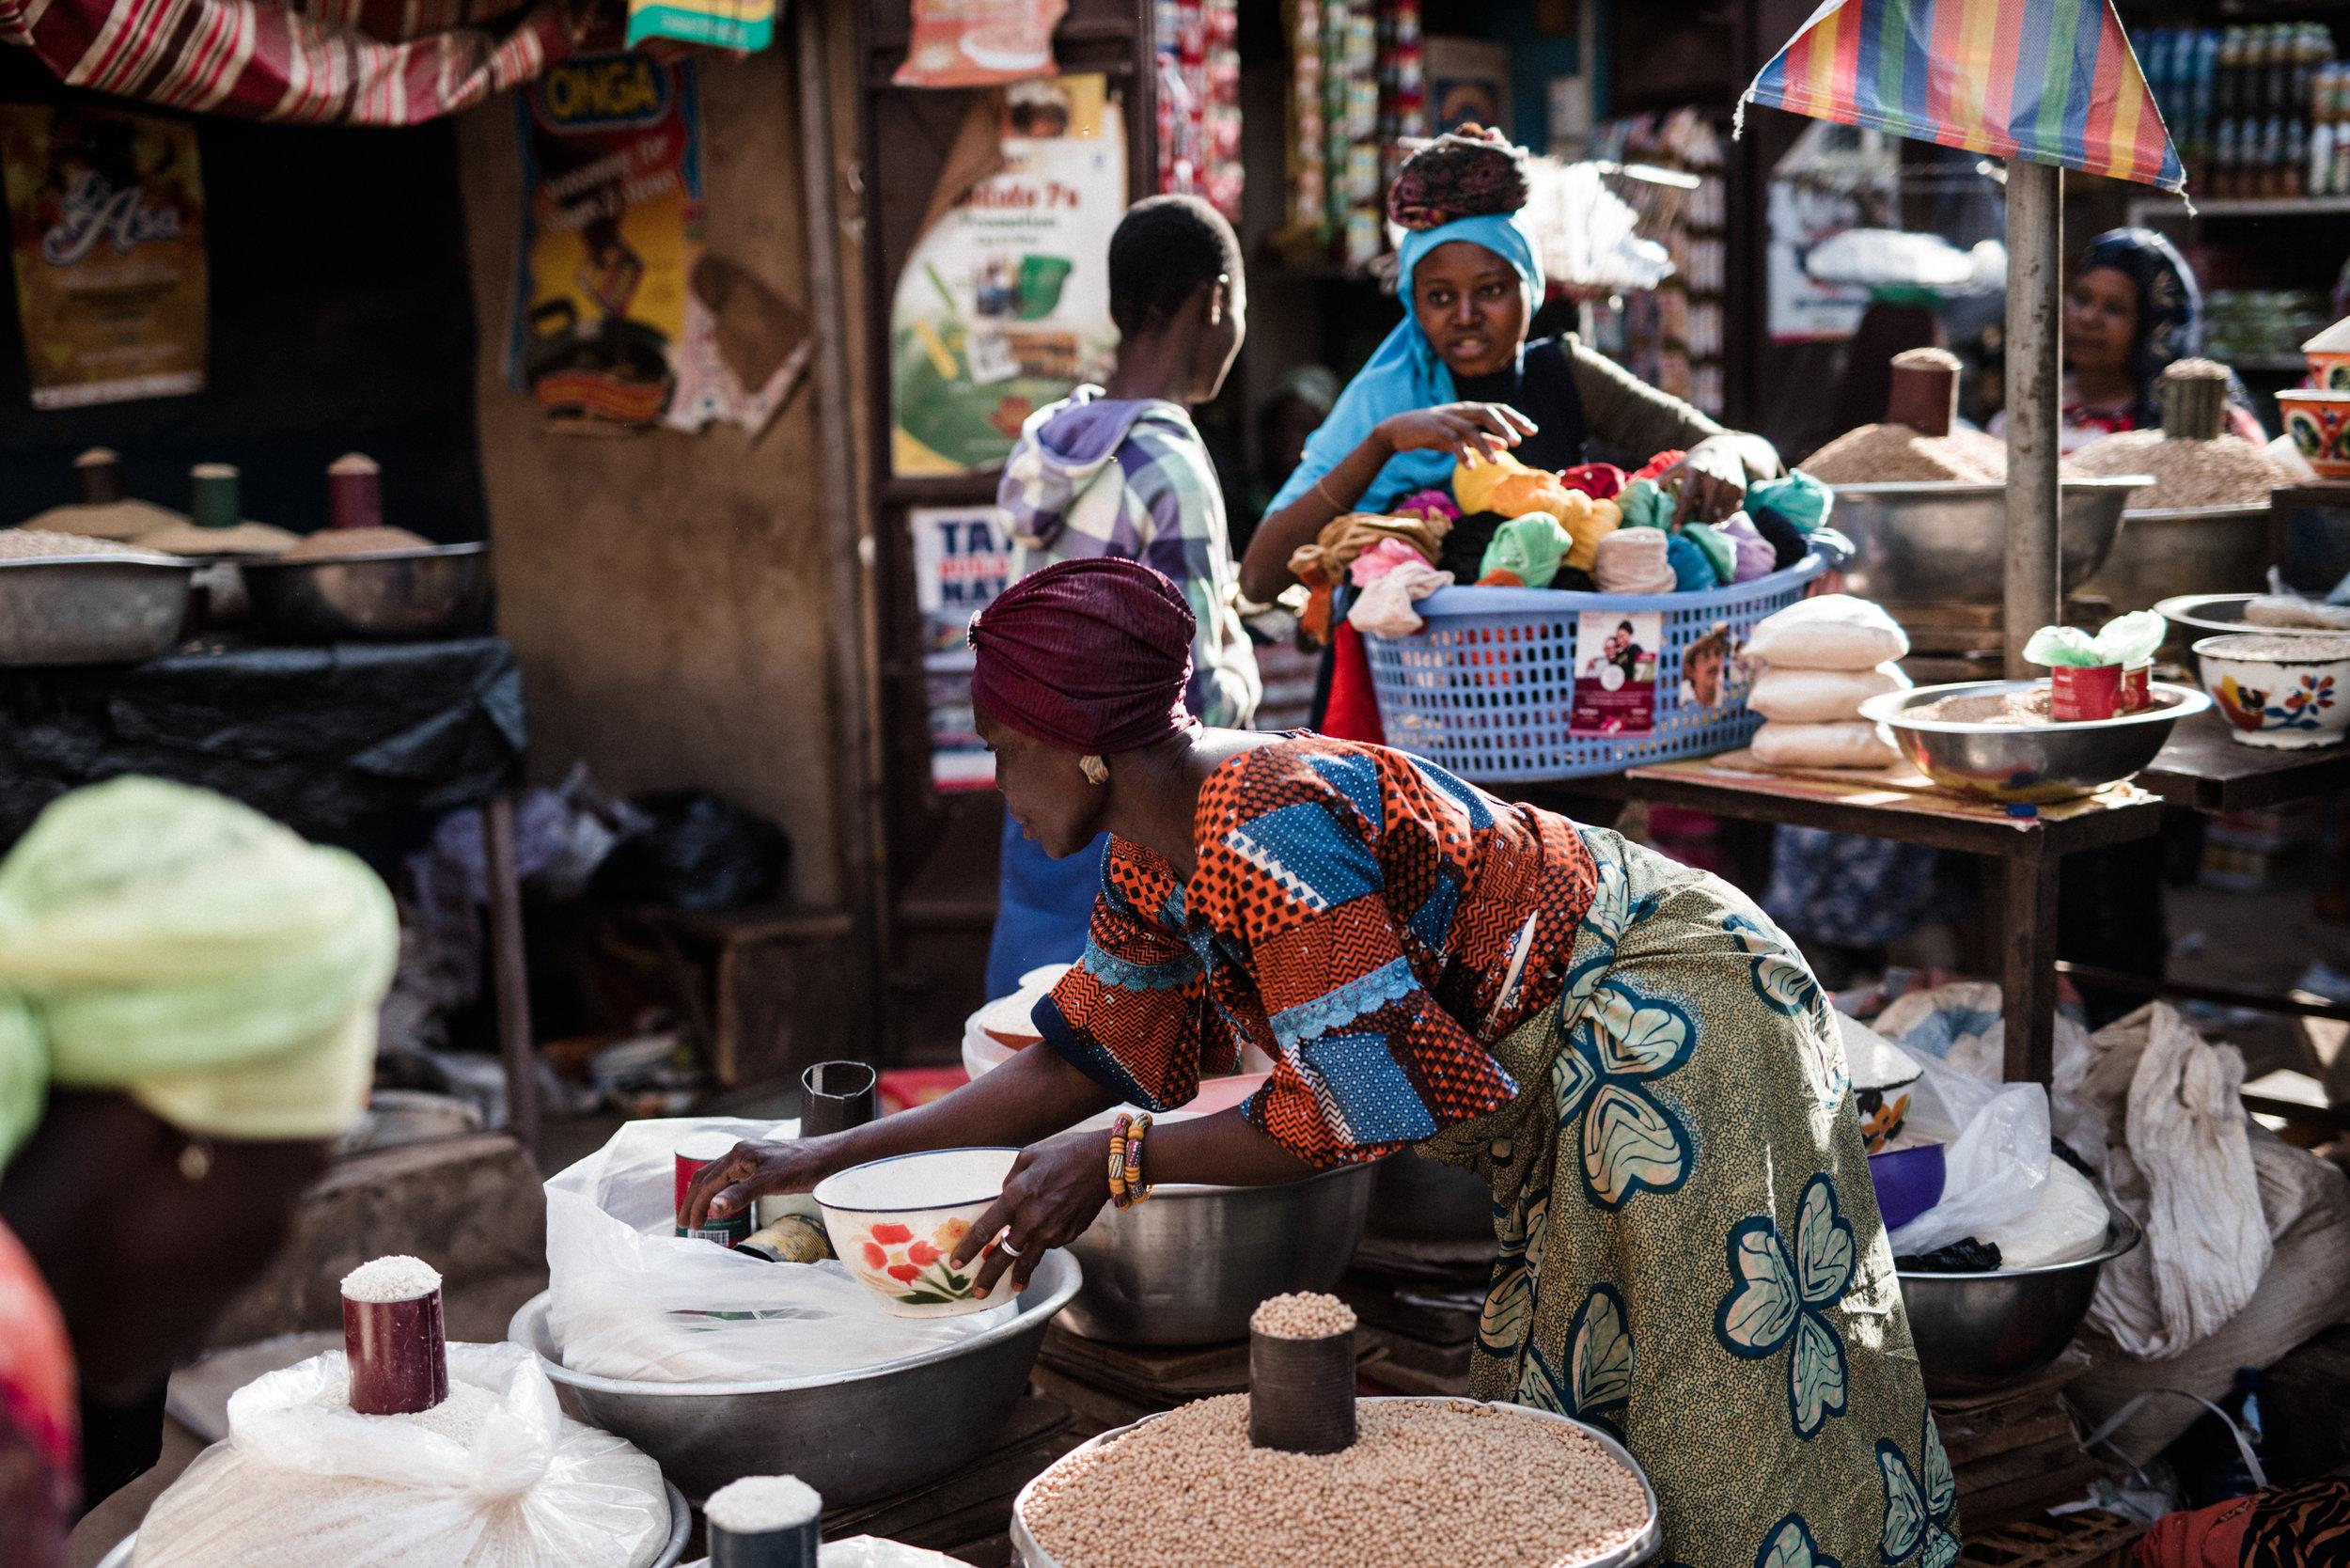 TaraShupe_HumanitarianPhotographer_Woman_Photographer_National_Geographic_Ghana_Women_051.jpg